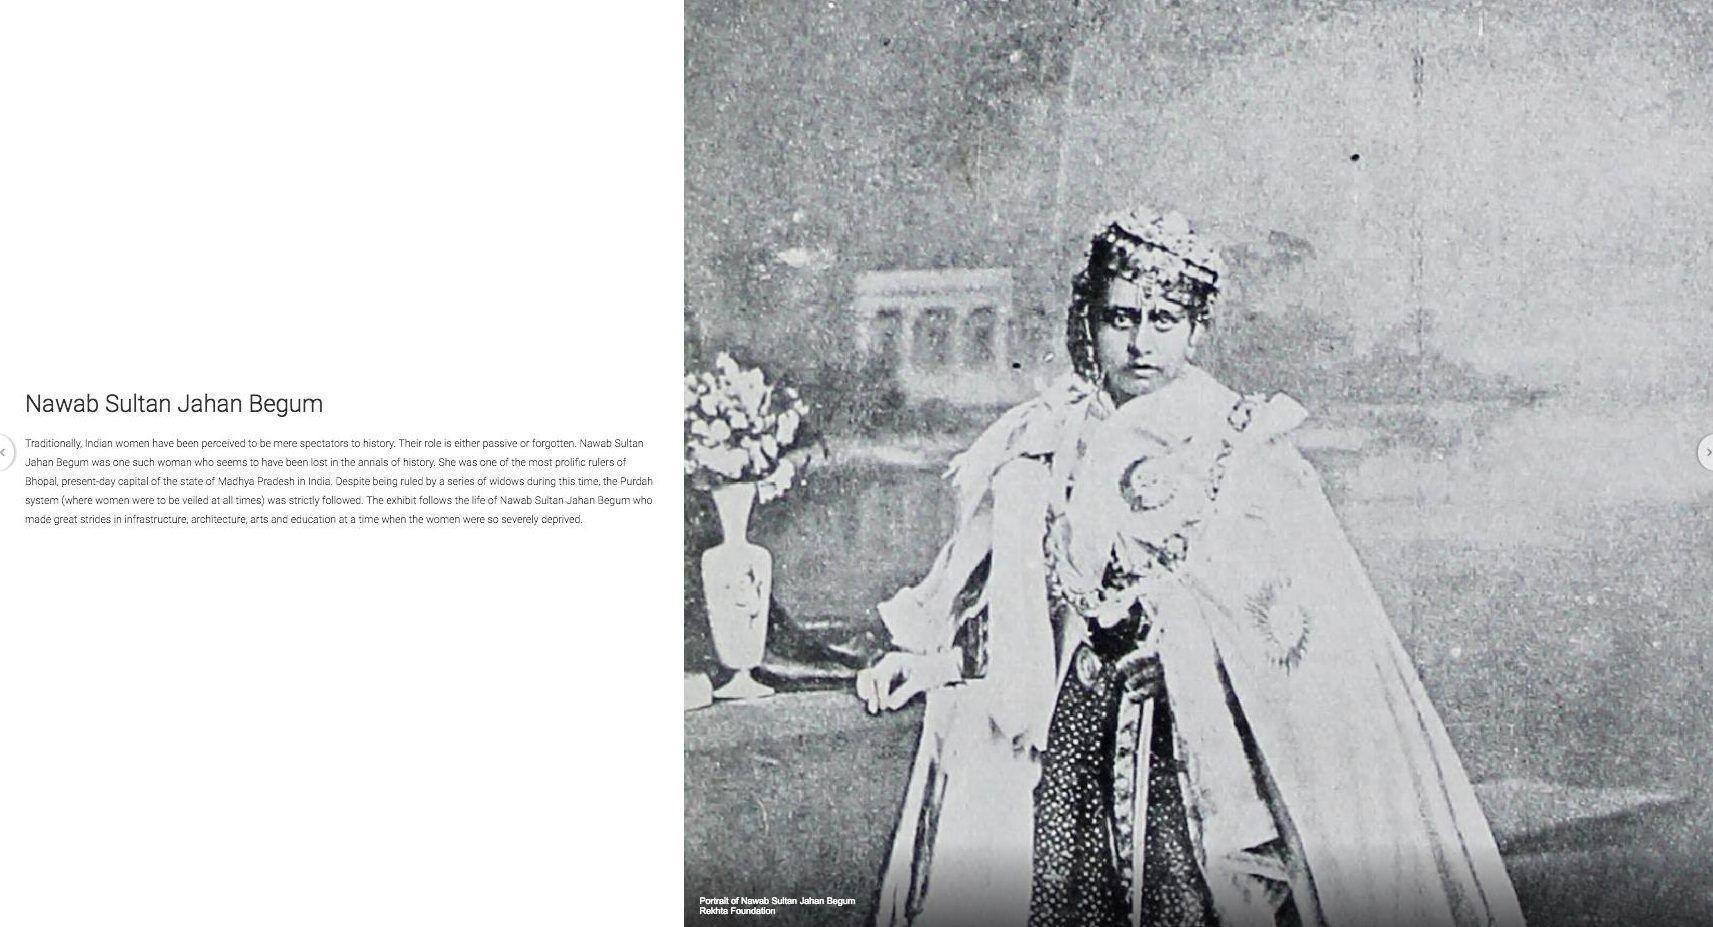 Famous Indian women